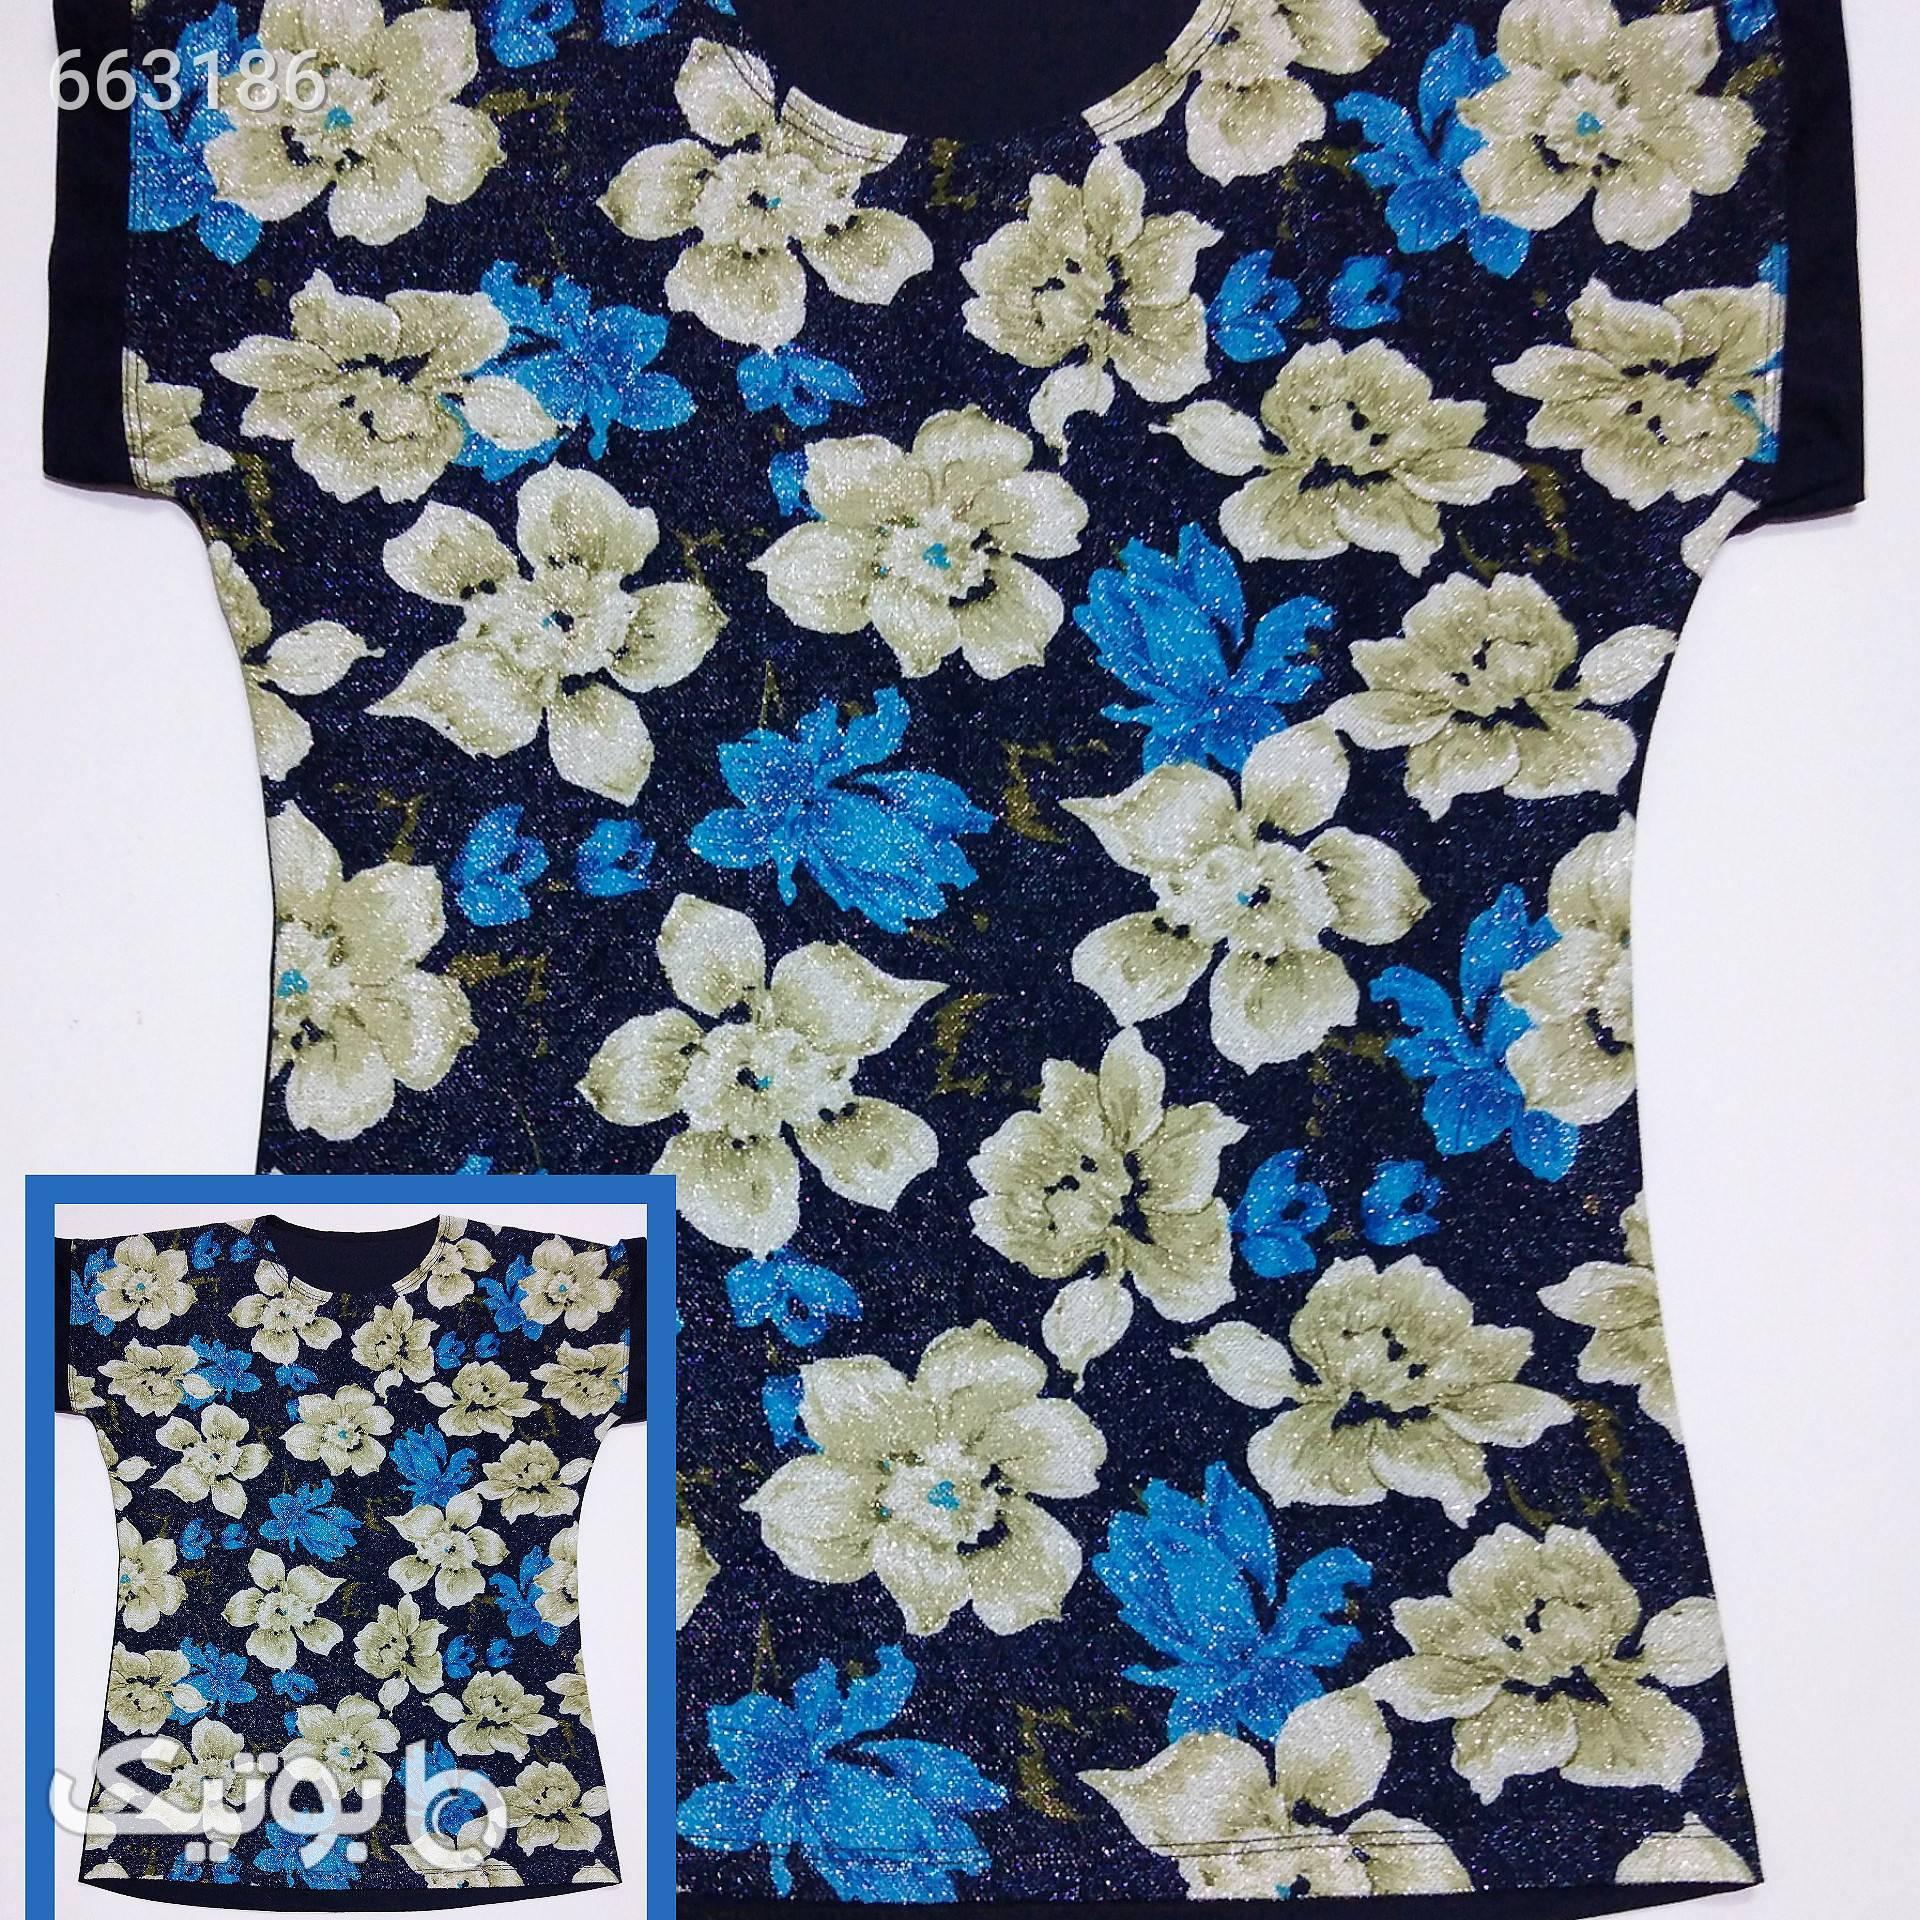 تیشرت گلدار زنانه لمه آبی تی شرت زنانه